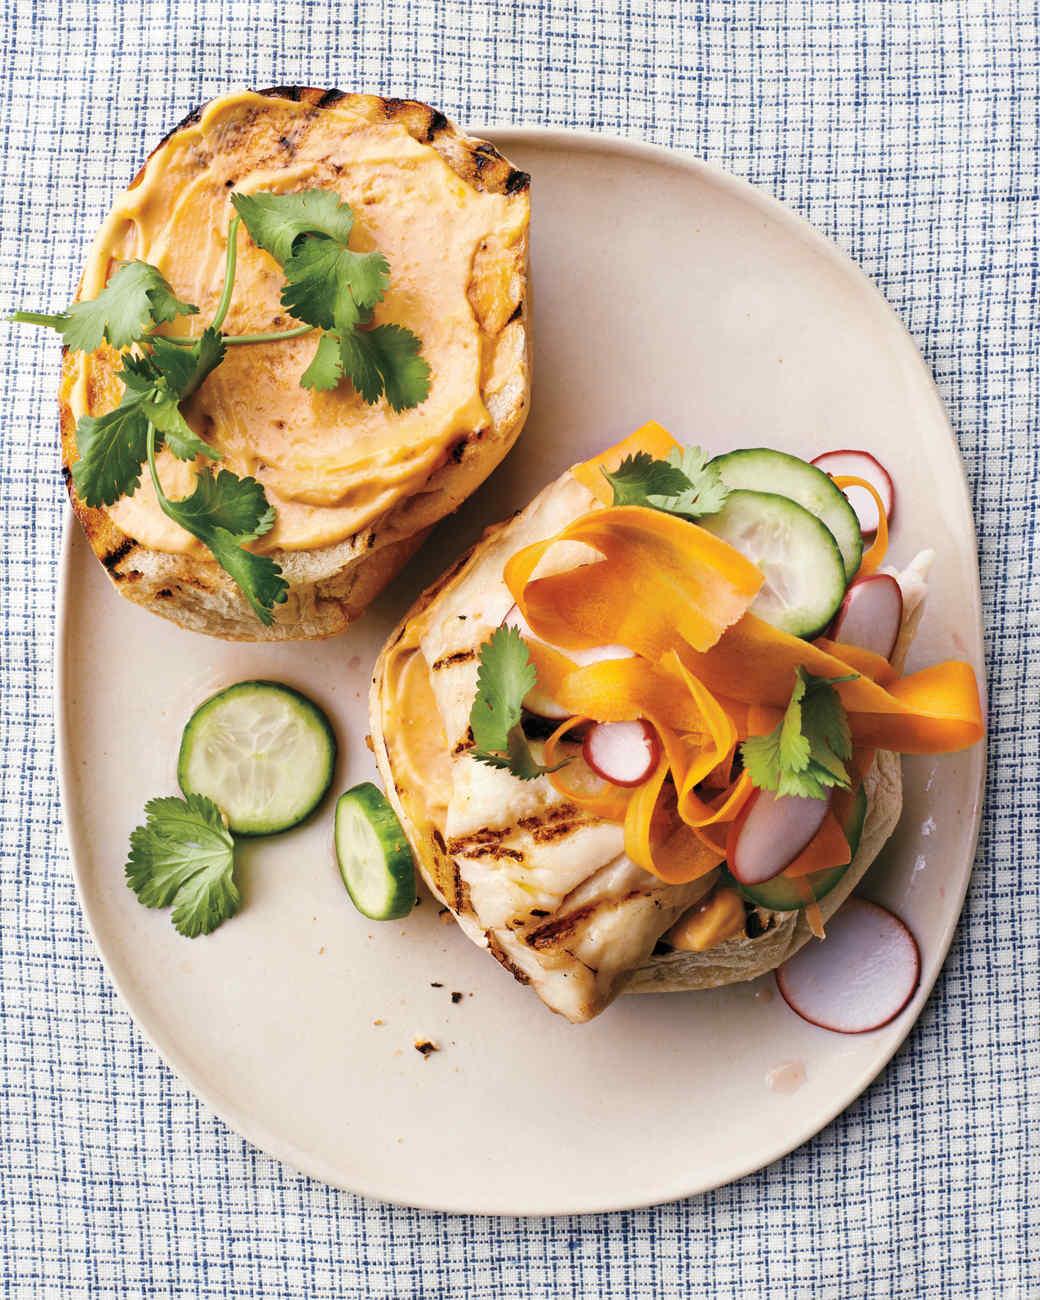 fish-sandwich-074-ld111042.jpg